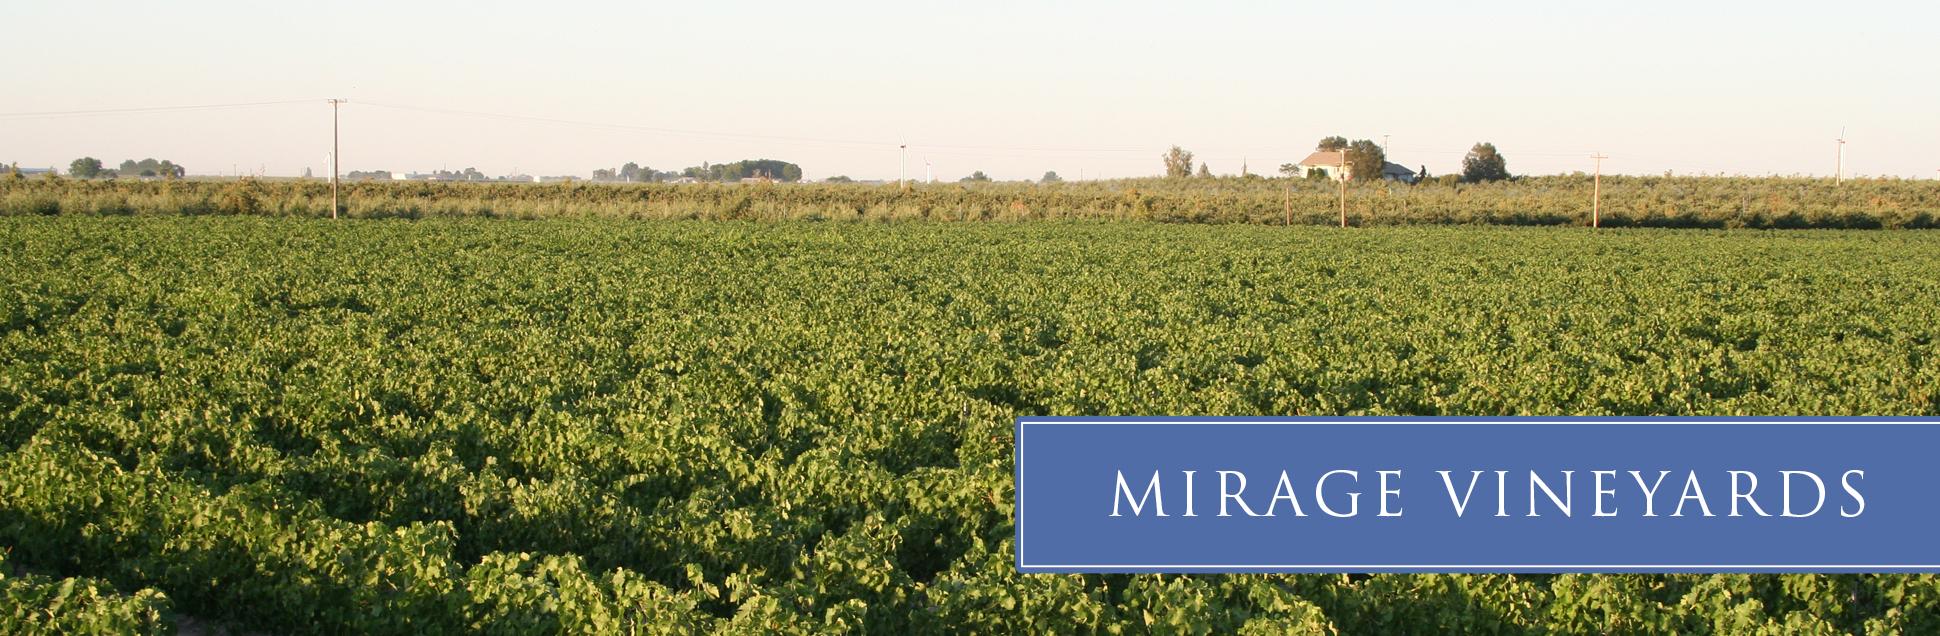 mirage-vineyard-06.jpg